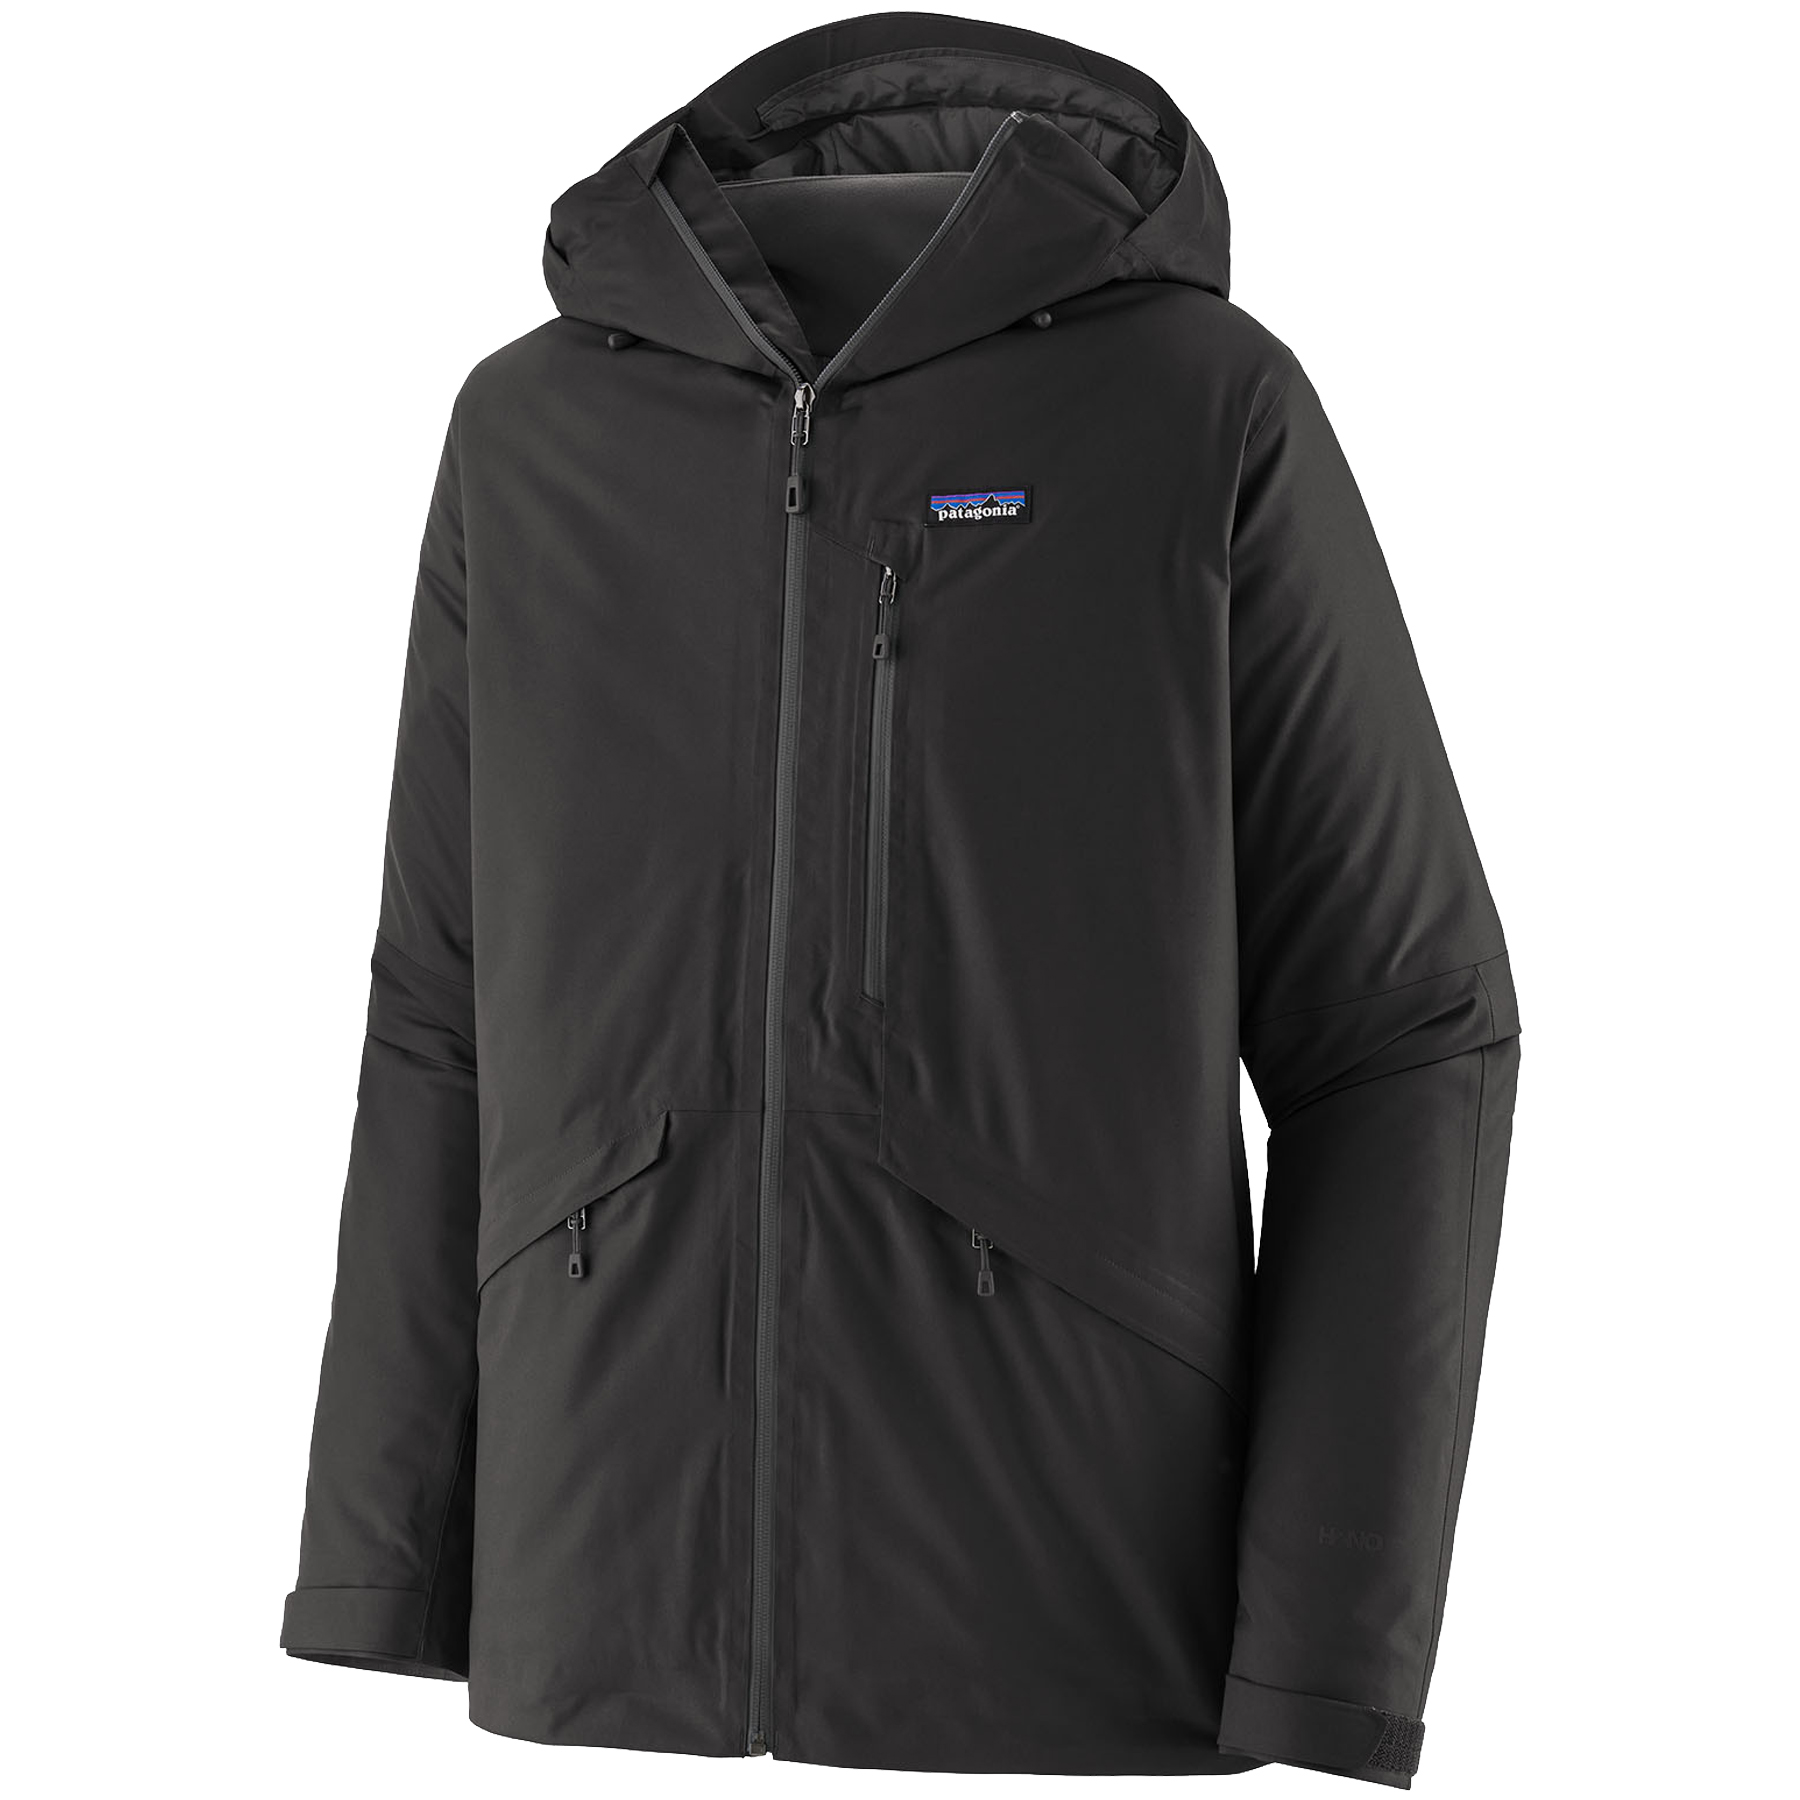 Patagonia Men's Insulated Snowshot Jacket (31080)